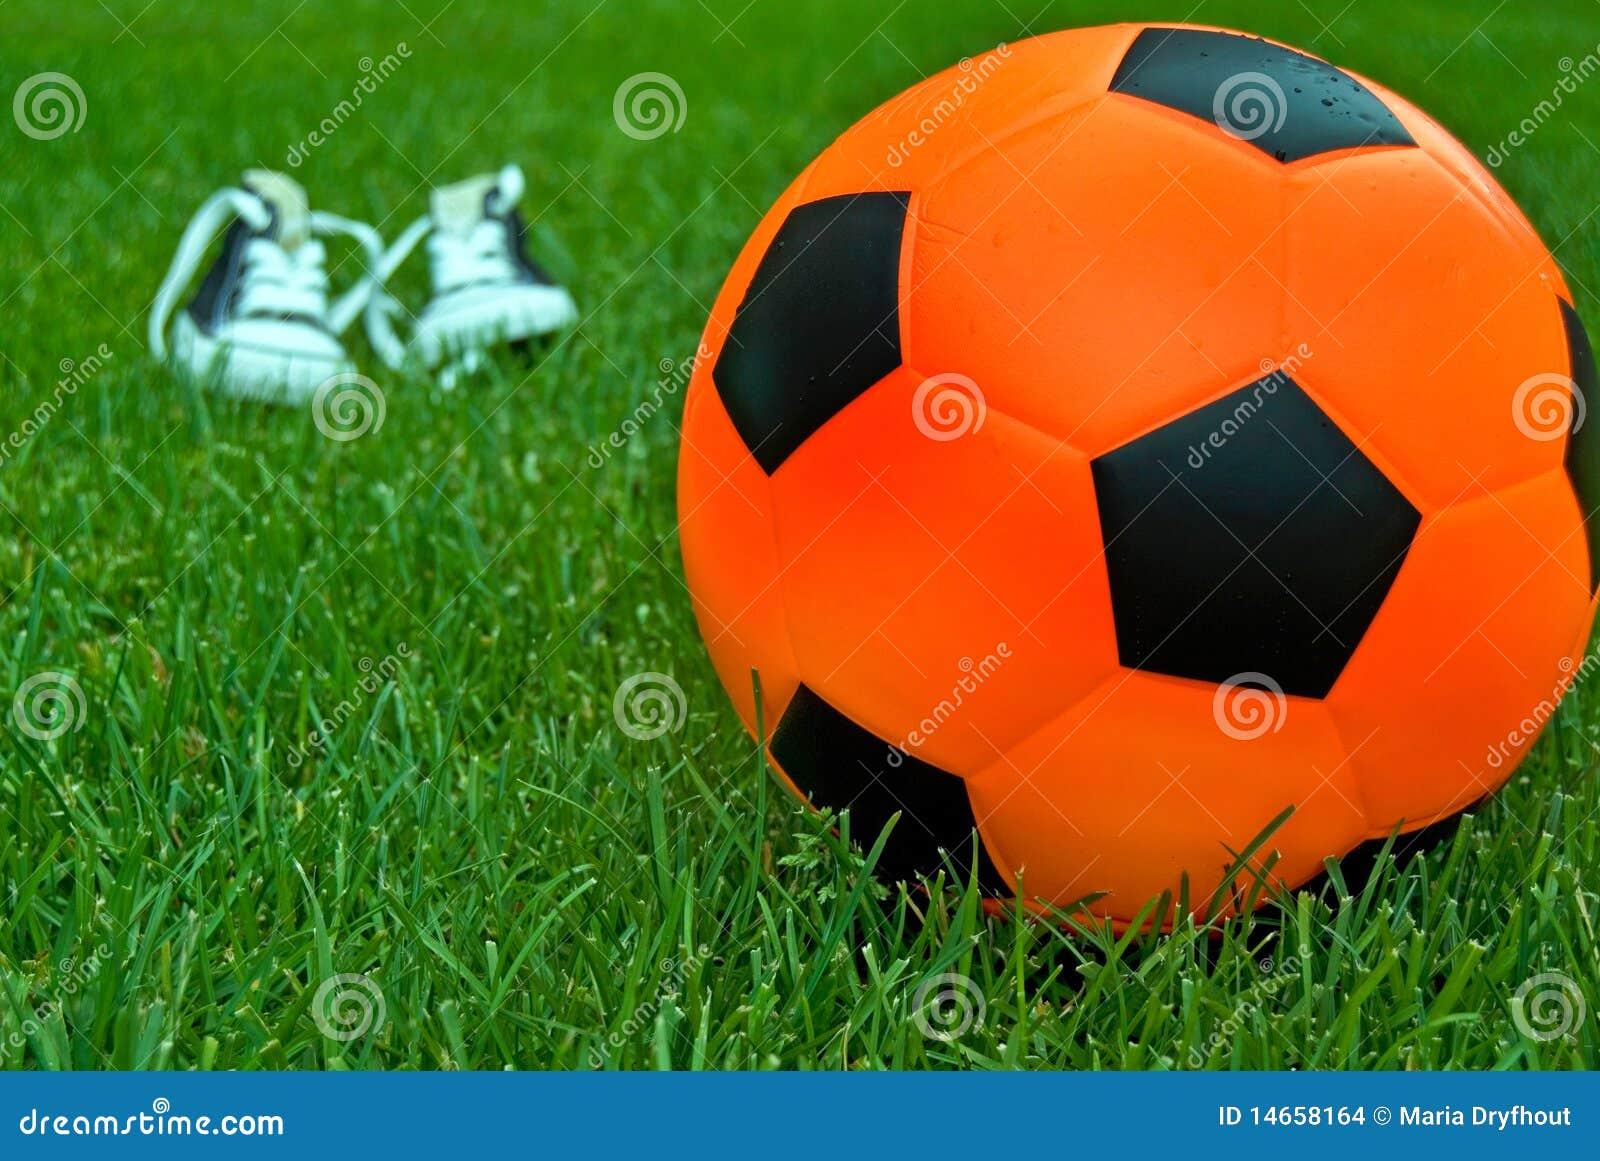 orange soccer ball stock photo image of game vivid 14658164